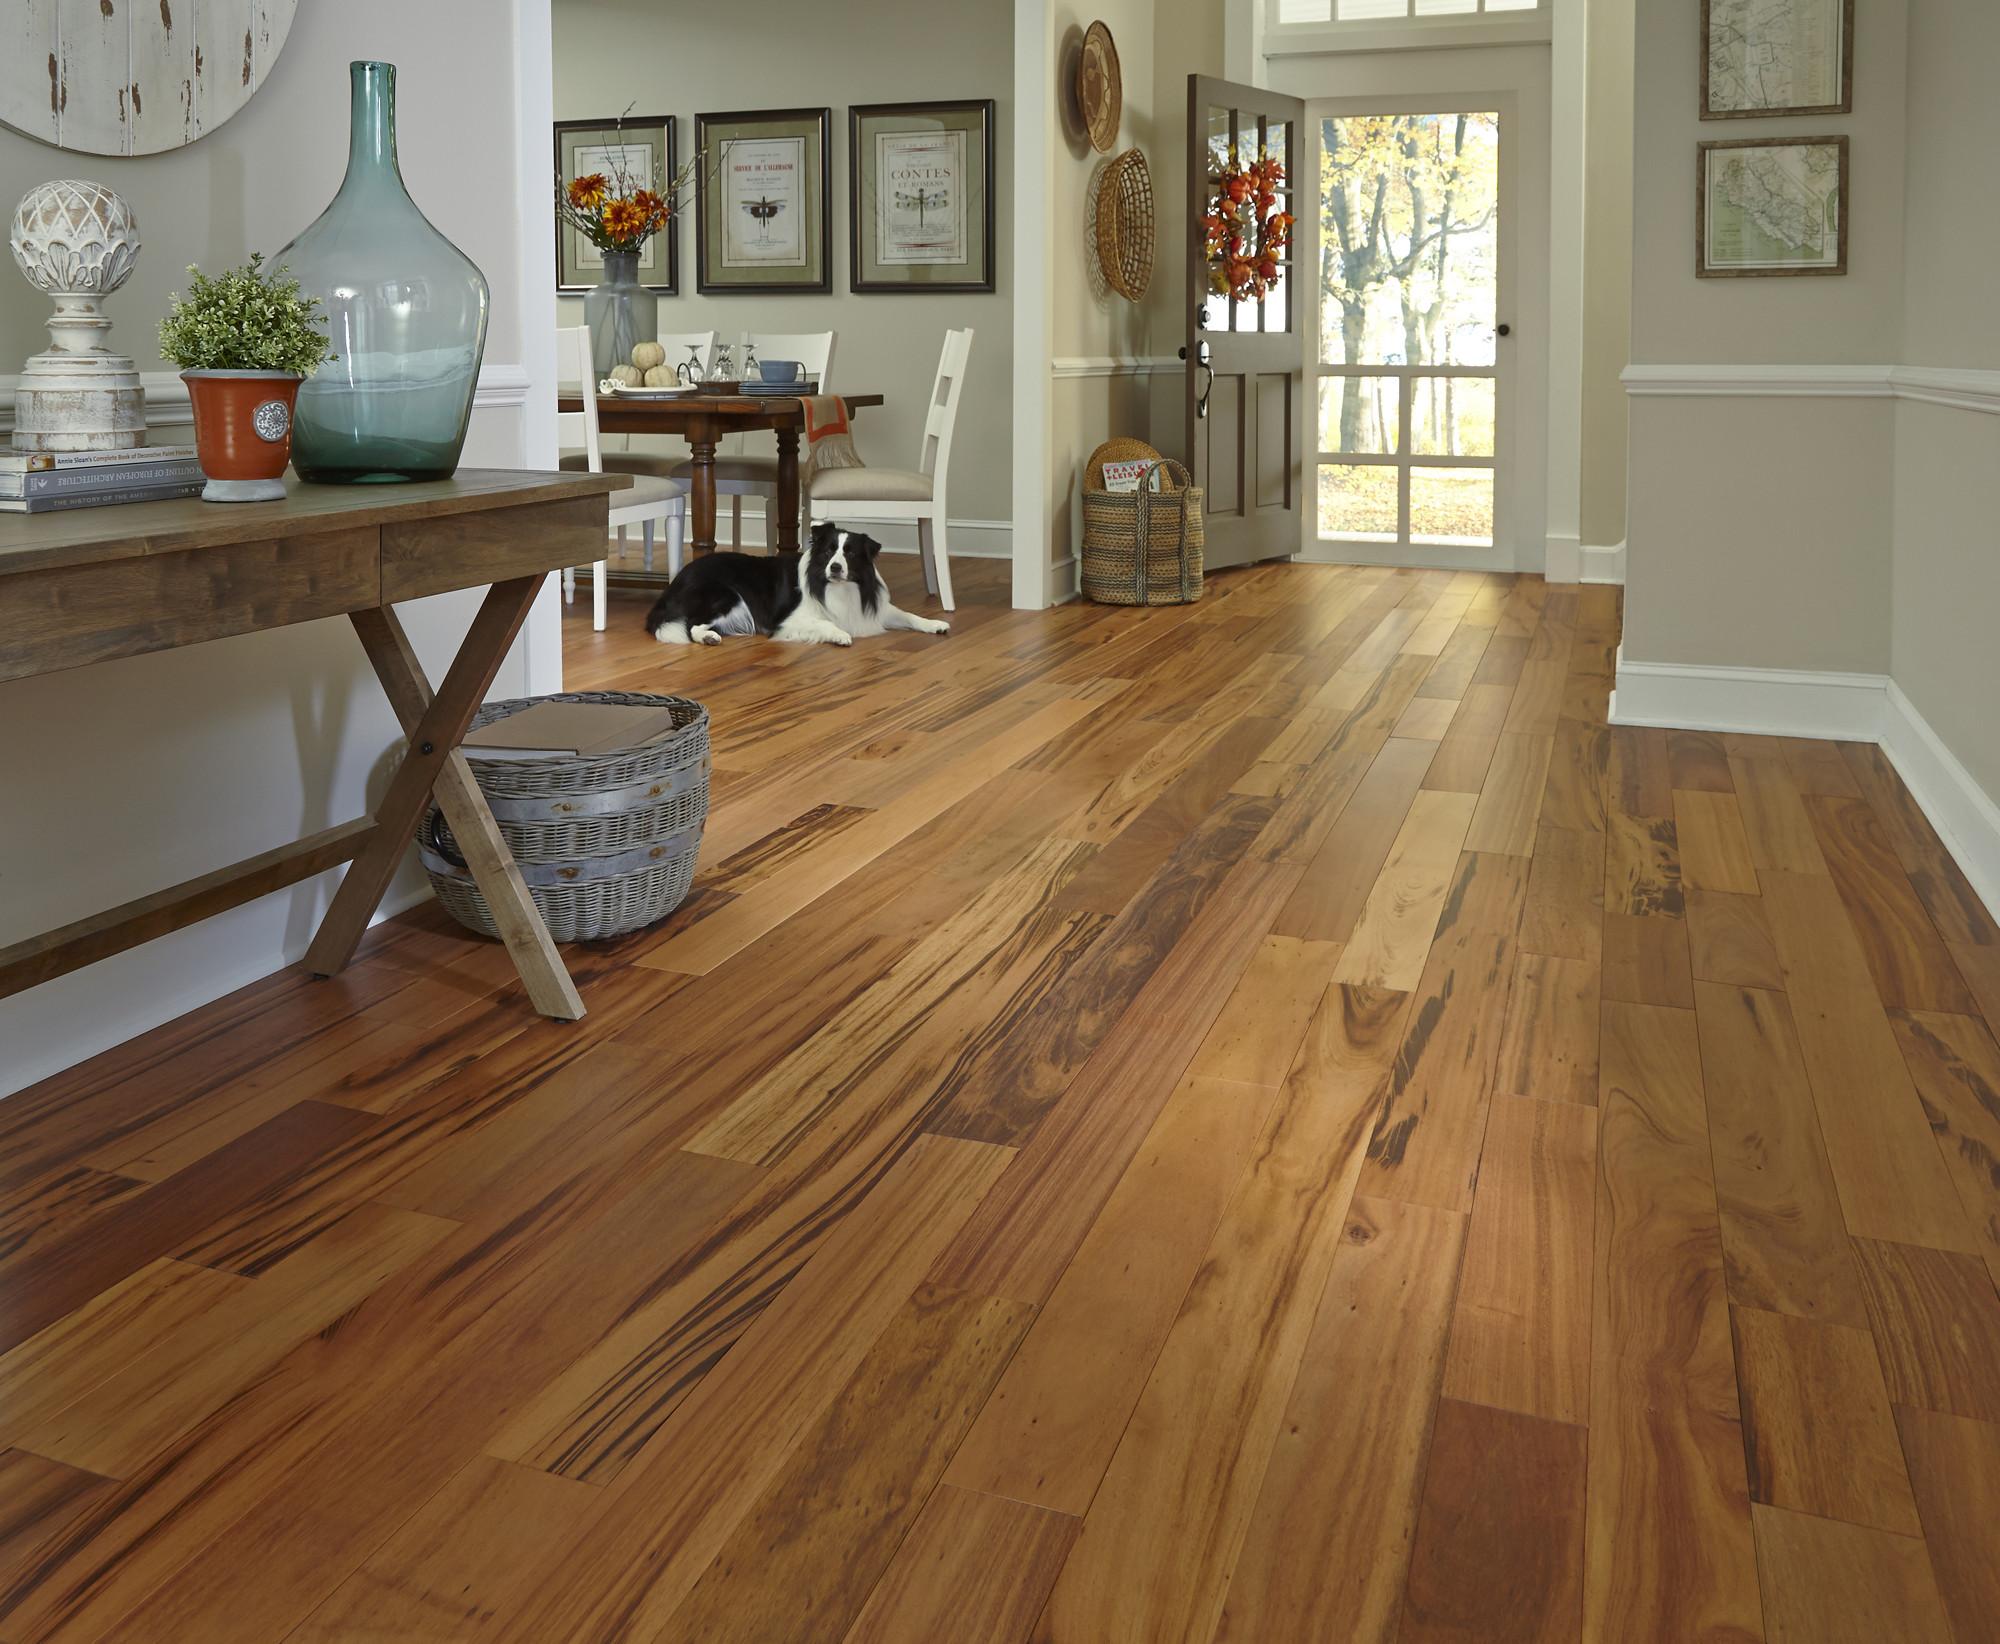 bamboo hardwood flooring prices of breathtaking lumber liquidators hardwood flooring beautiful floors inside breathtaking lumber liquidators hardwood flooring